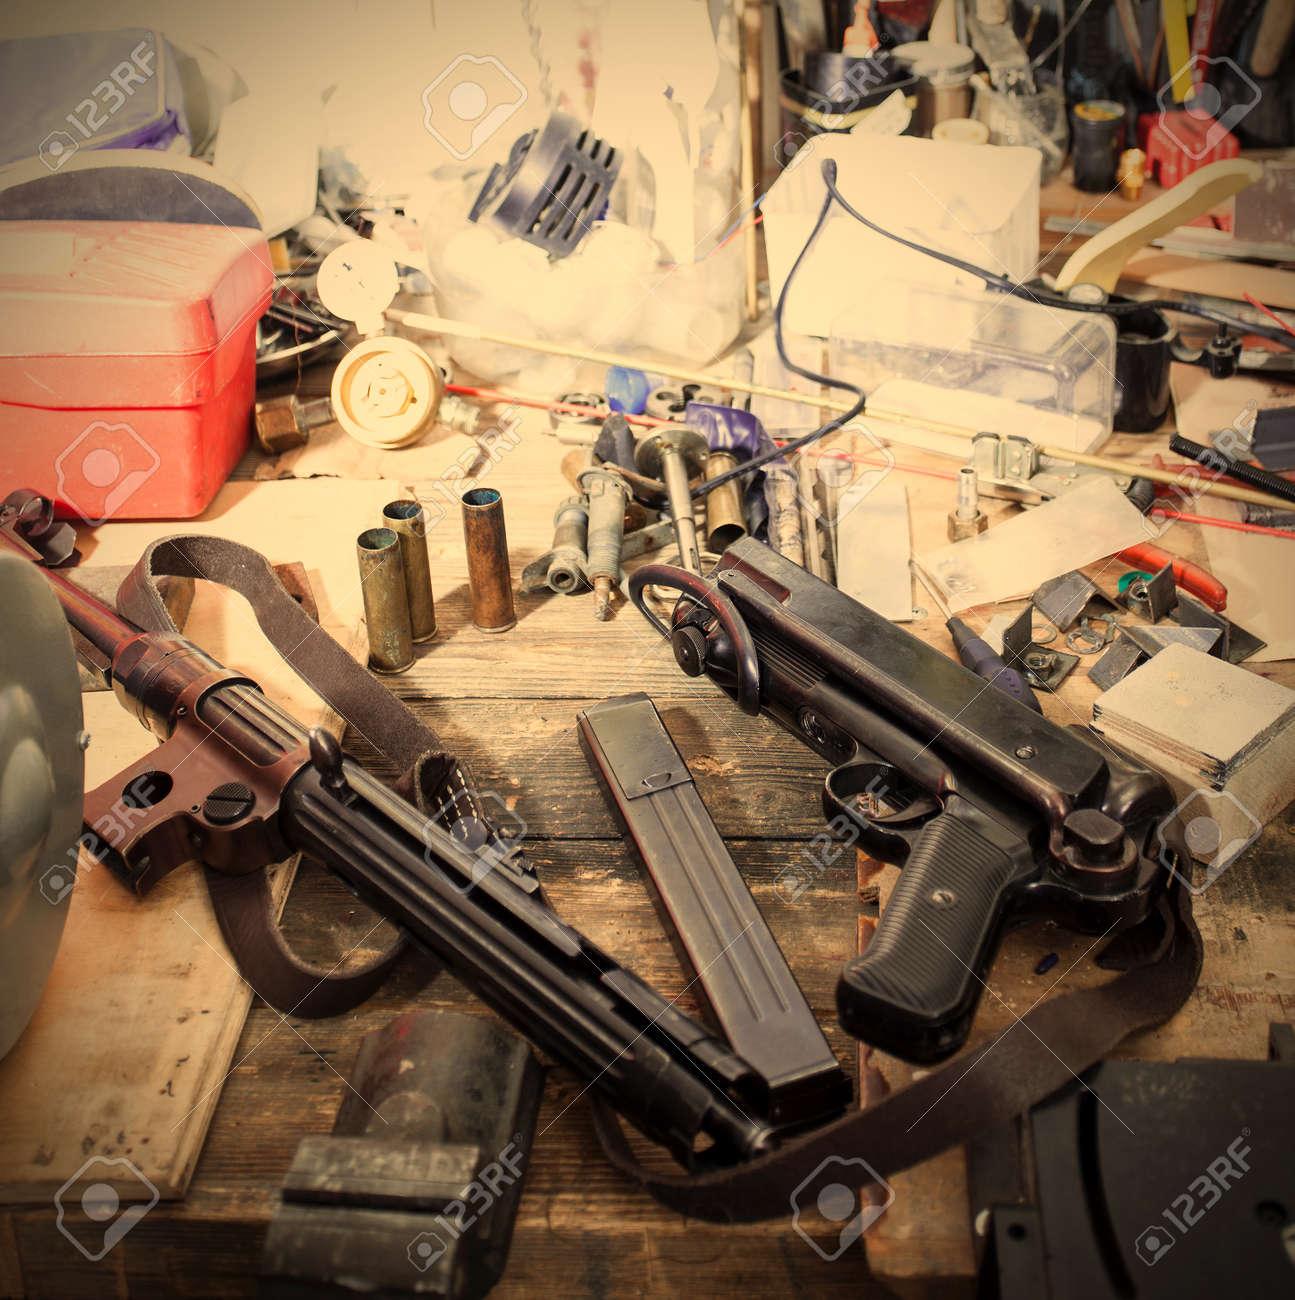 MP38 sub machine gun on the table master restorer in the interior